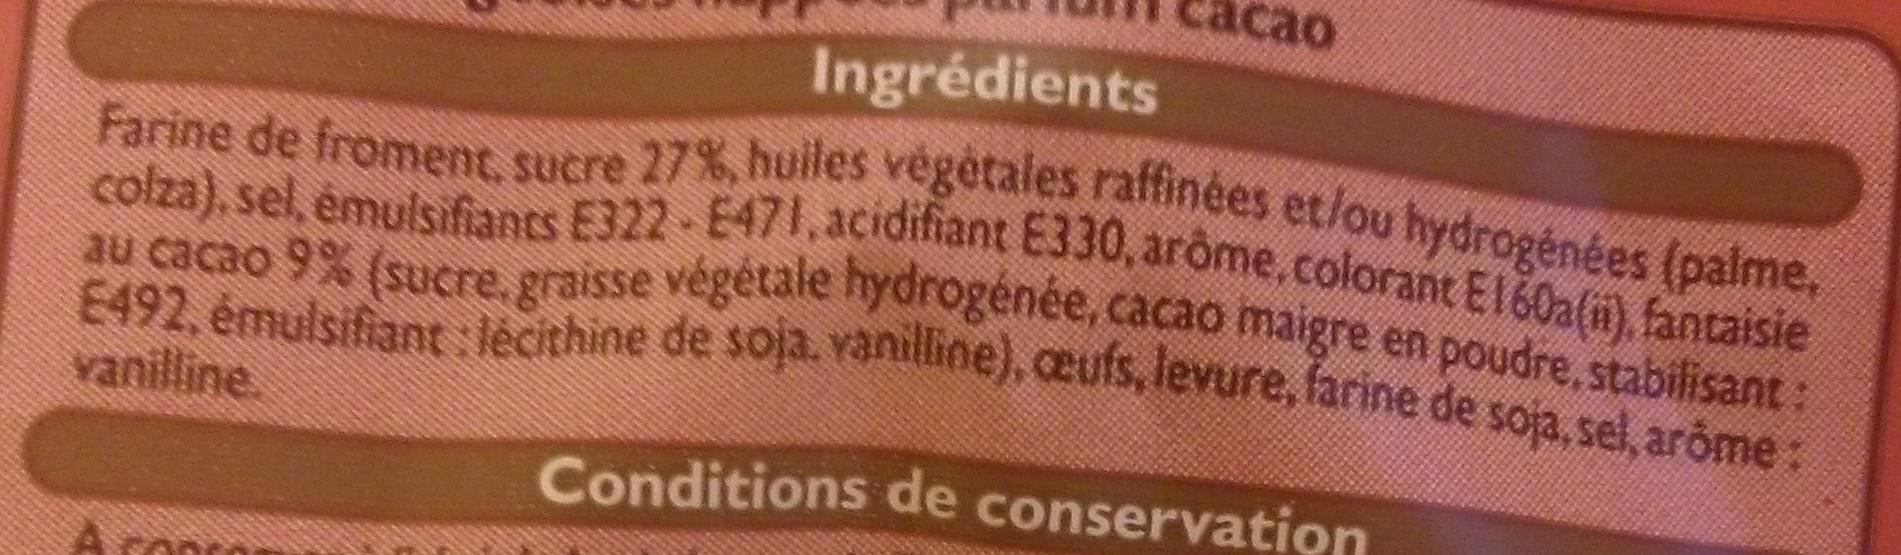 5 gaufres liégeoises - Ingrédients